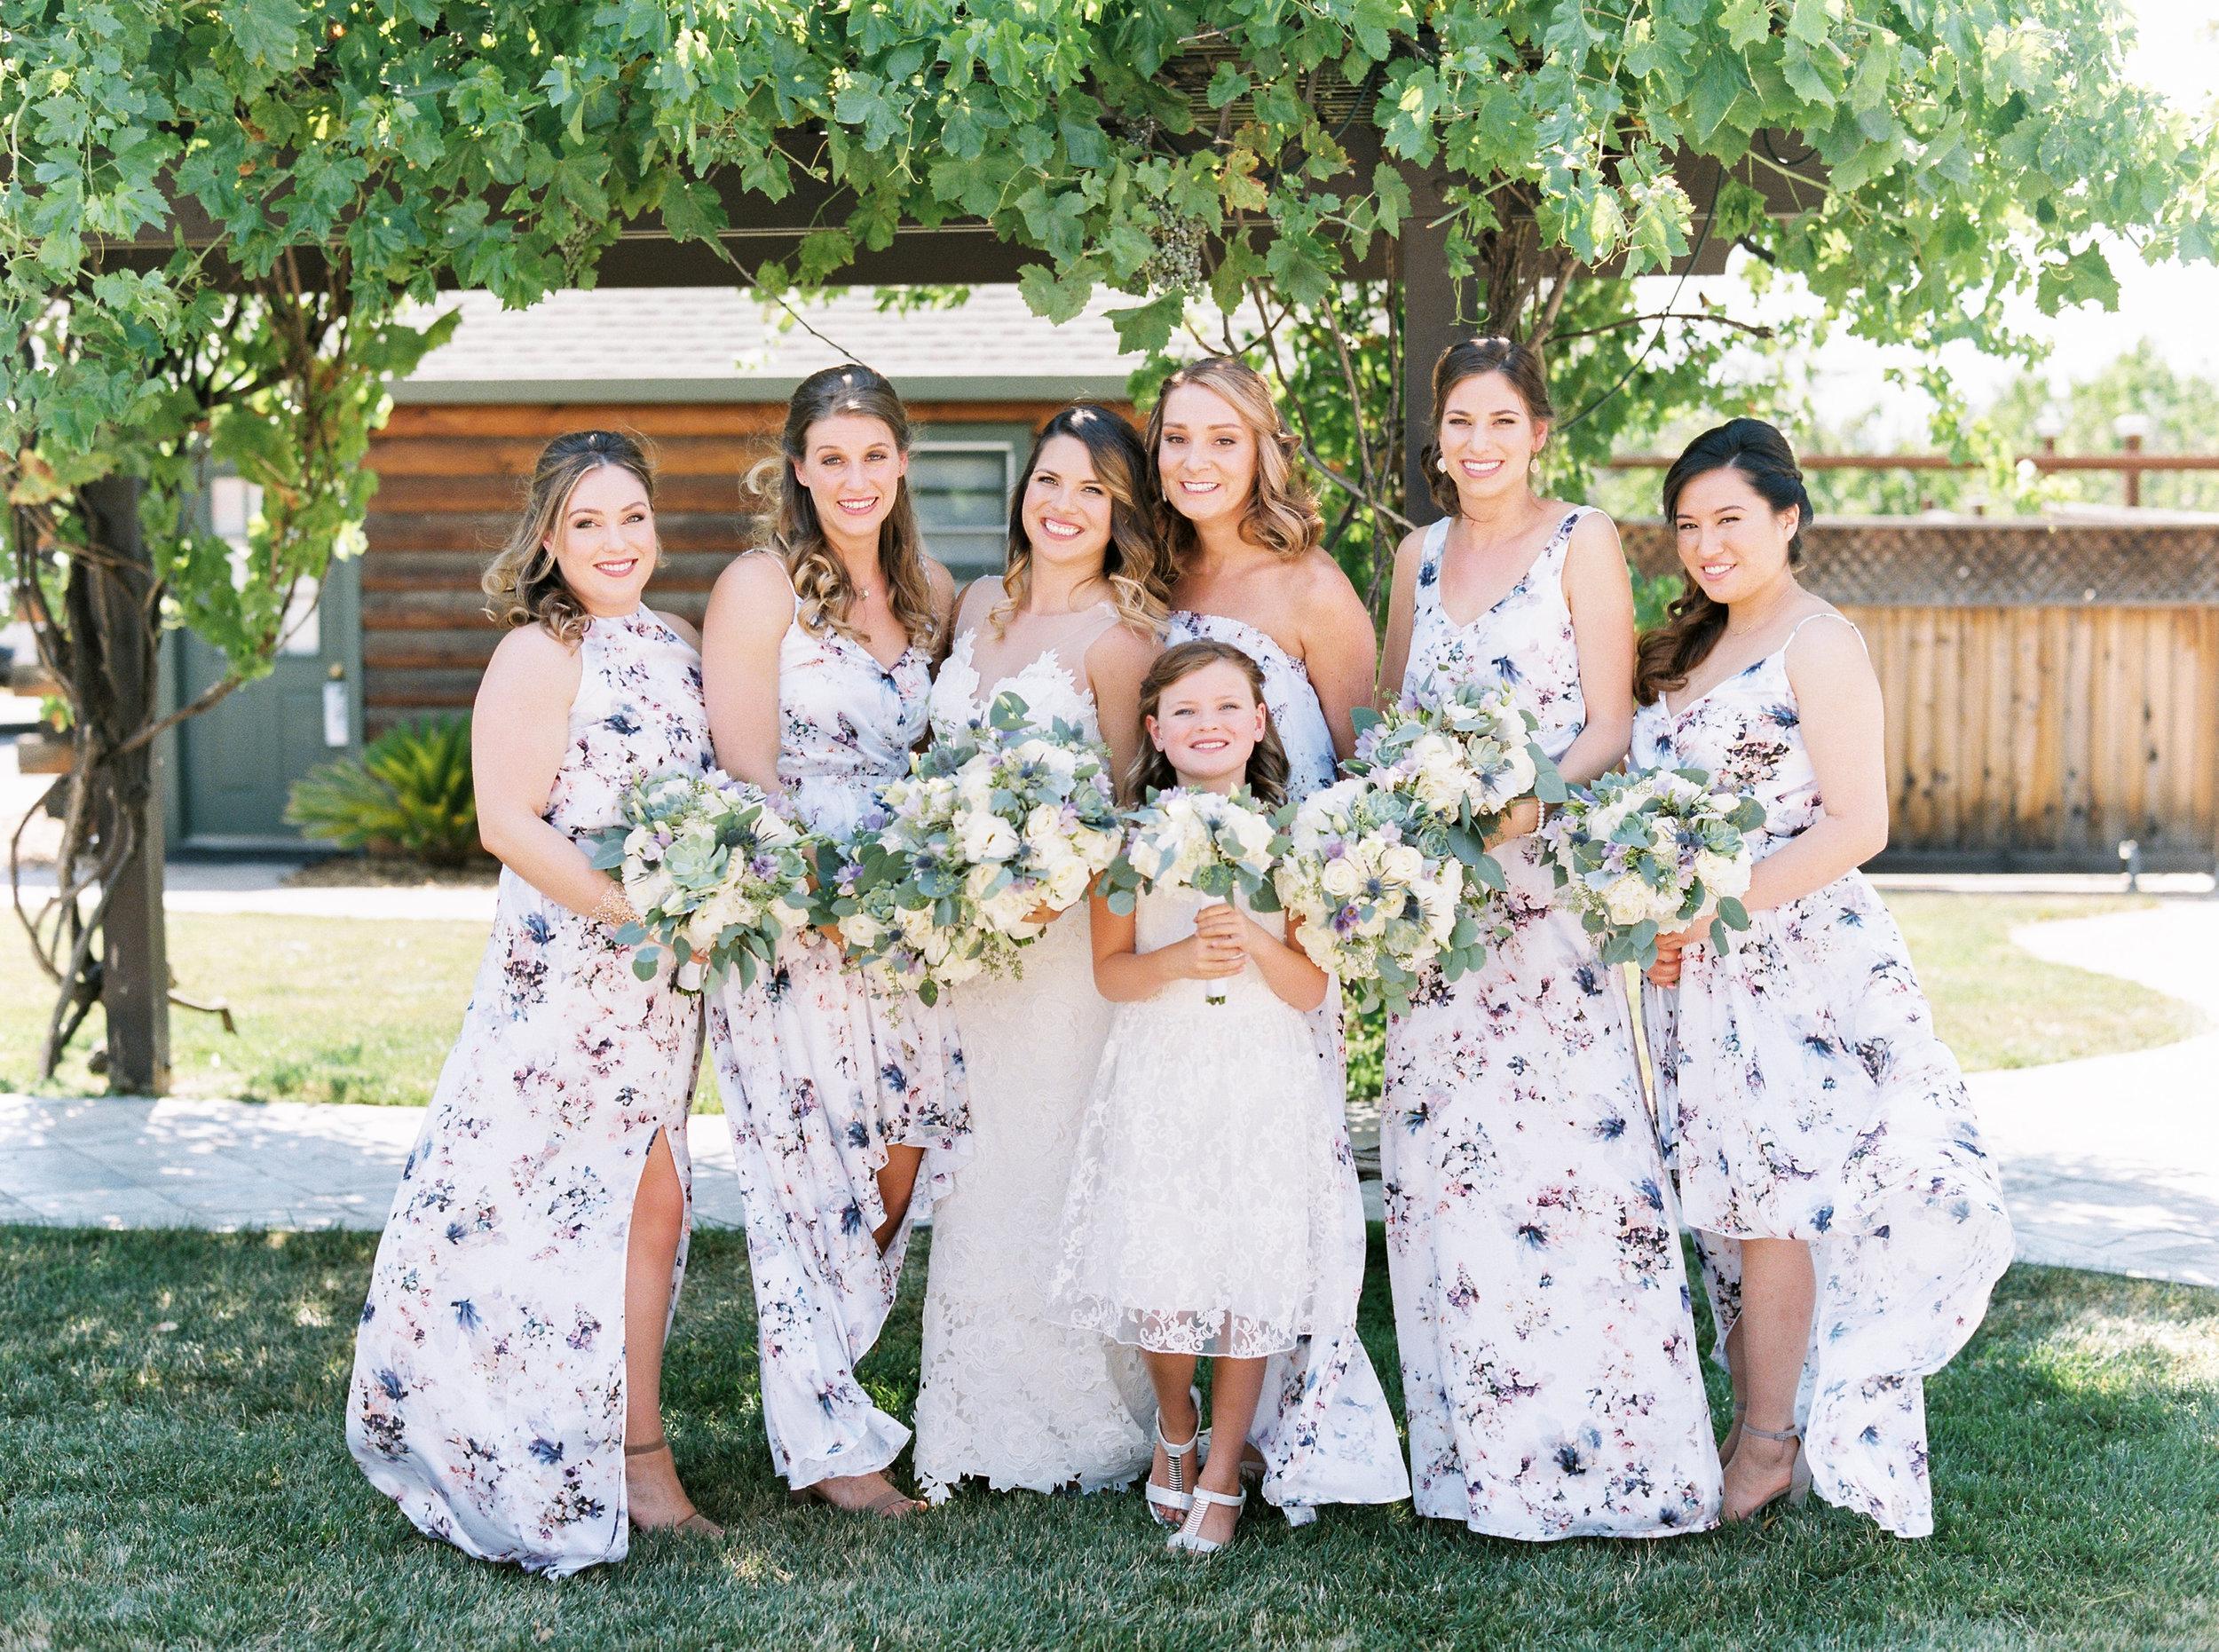 the-purple-orchid-resort-wedding-in-livermore-california-197.jpg